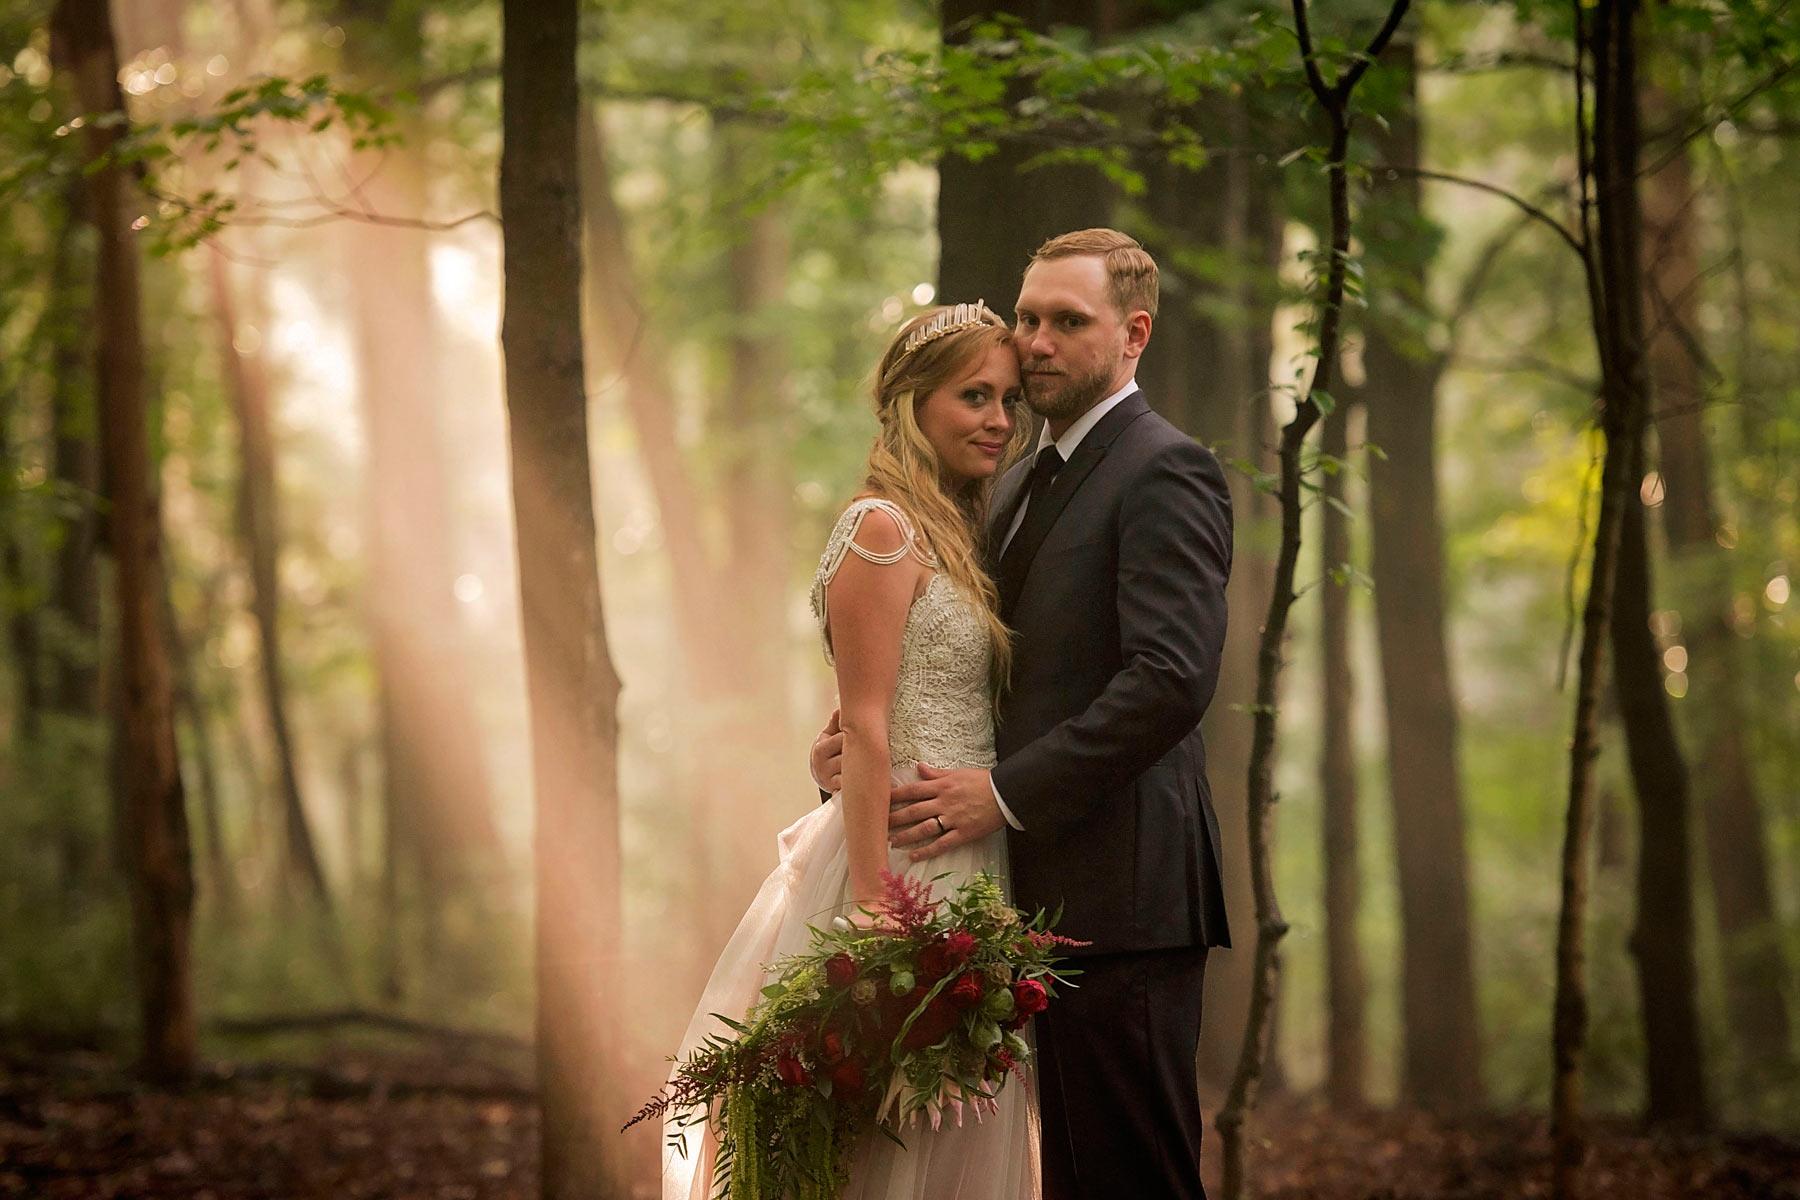 Bucks_County_wedding_photographer_Stroudsmoor_country_inn_wedding_Philadelphia_wedding_photographer_21_woodland_wedding.JPG